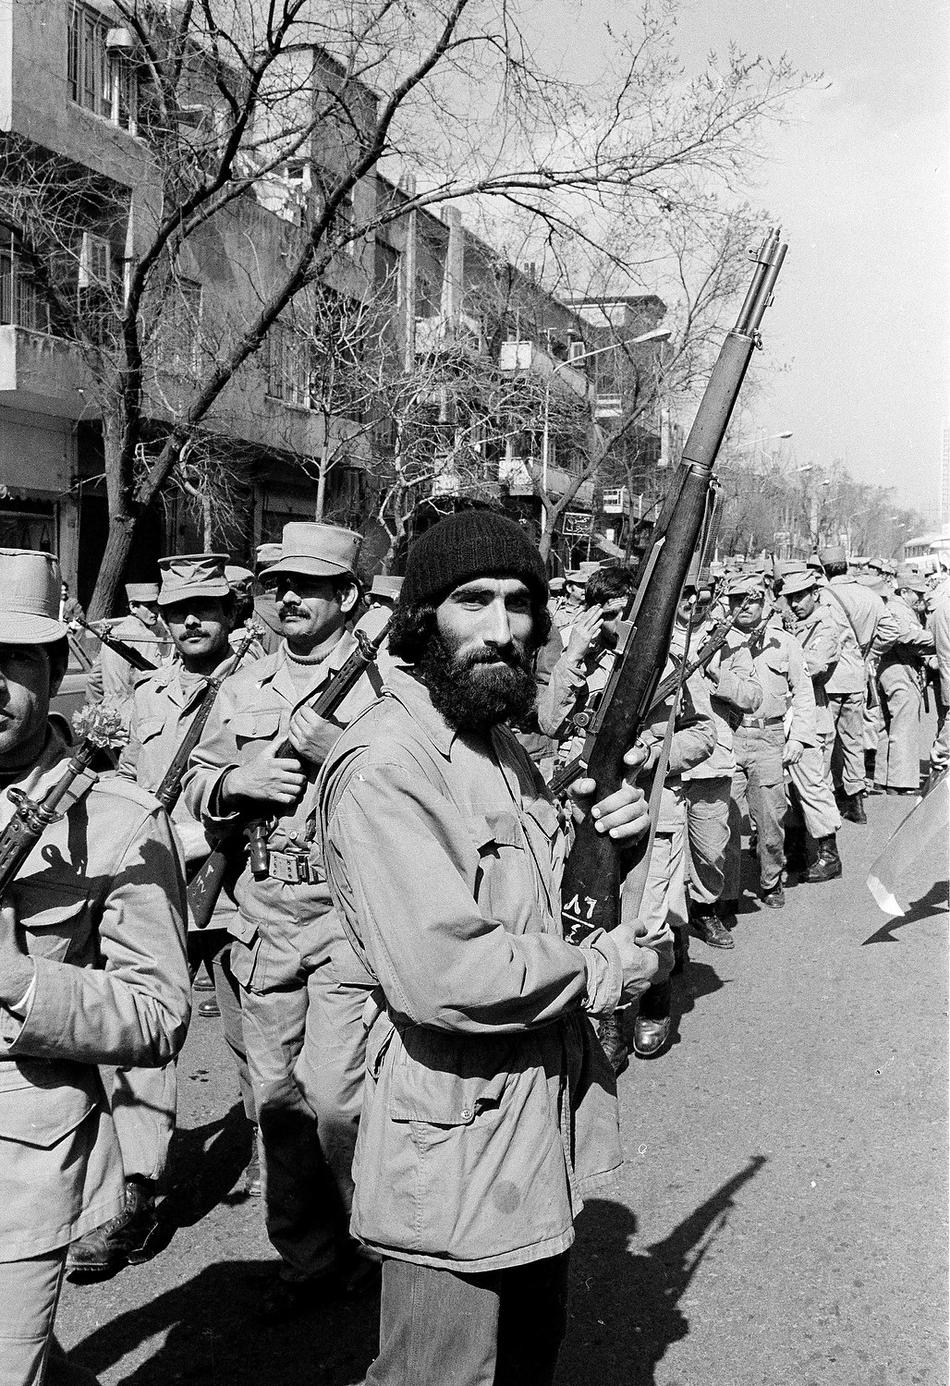 IRAN ISLAMIC REVOLUTION 1979